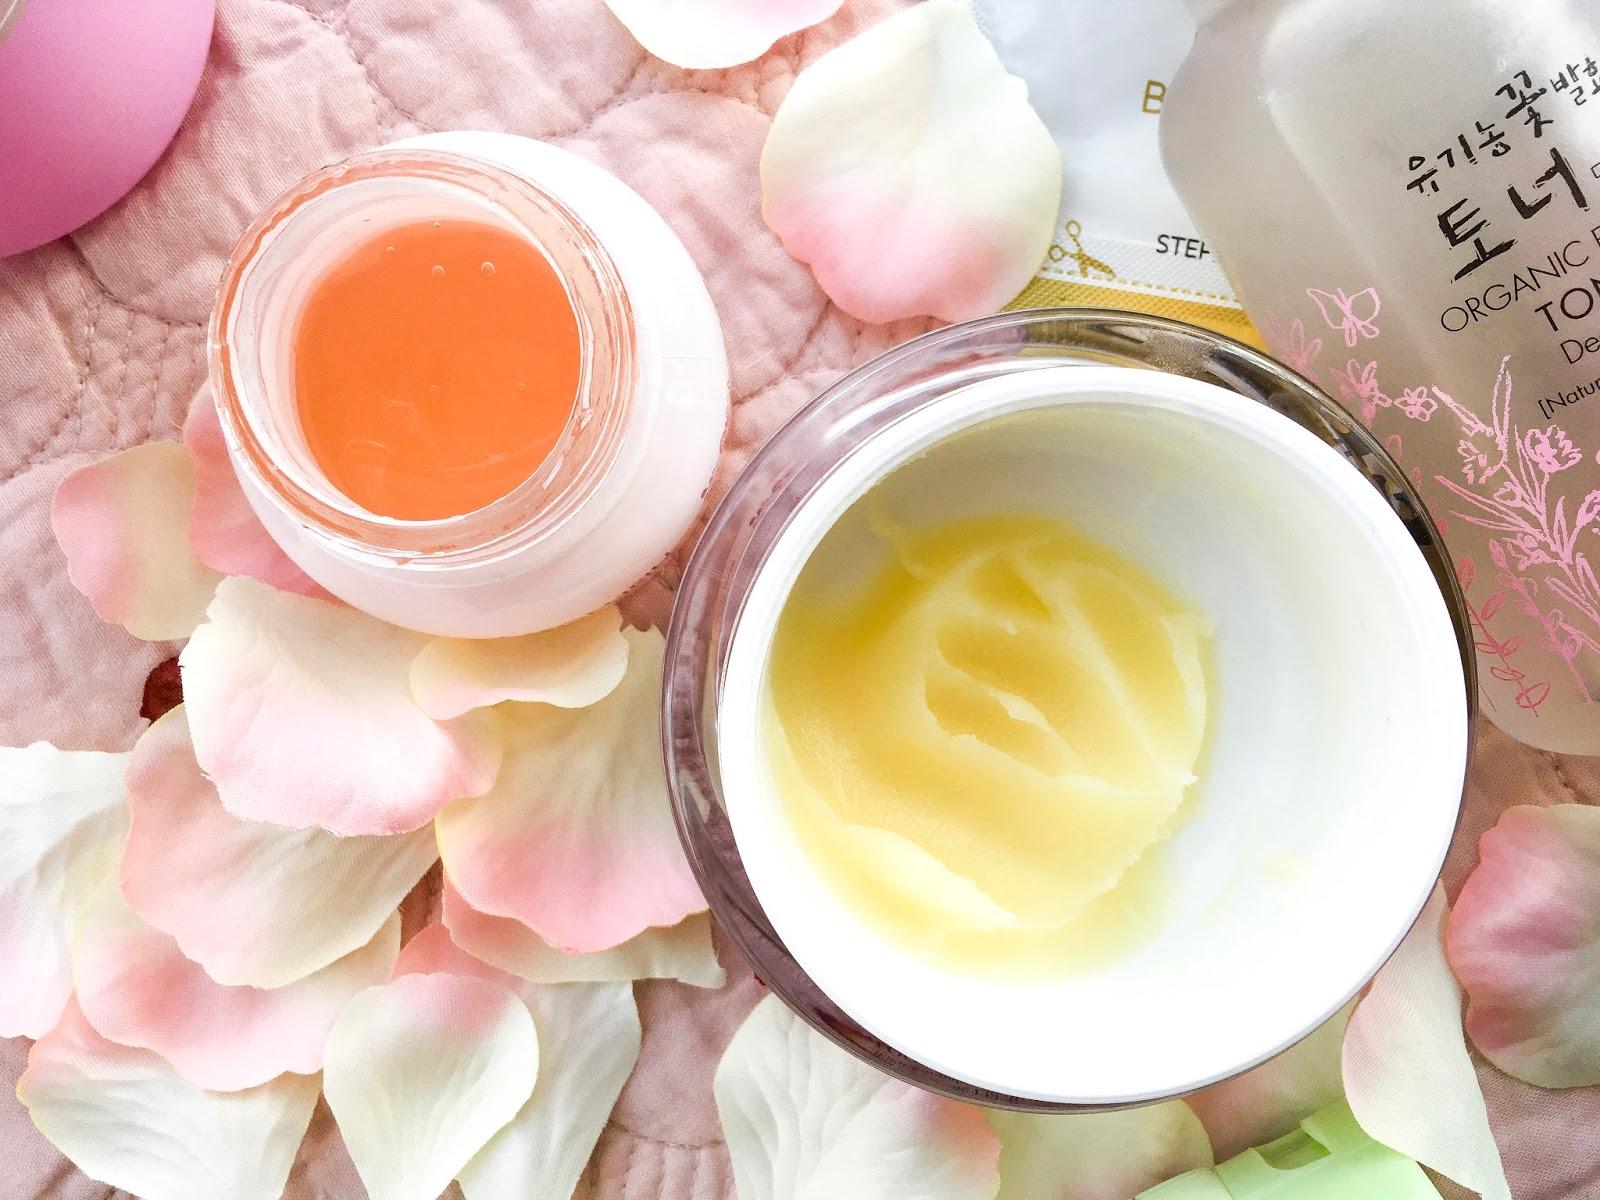 blossom jeju pink camellia soombi blooming vitamin sleeping mask, emma hardie moringa cleansing balm